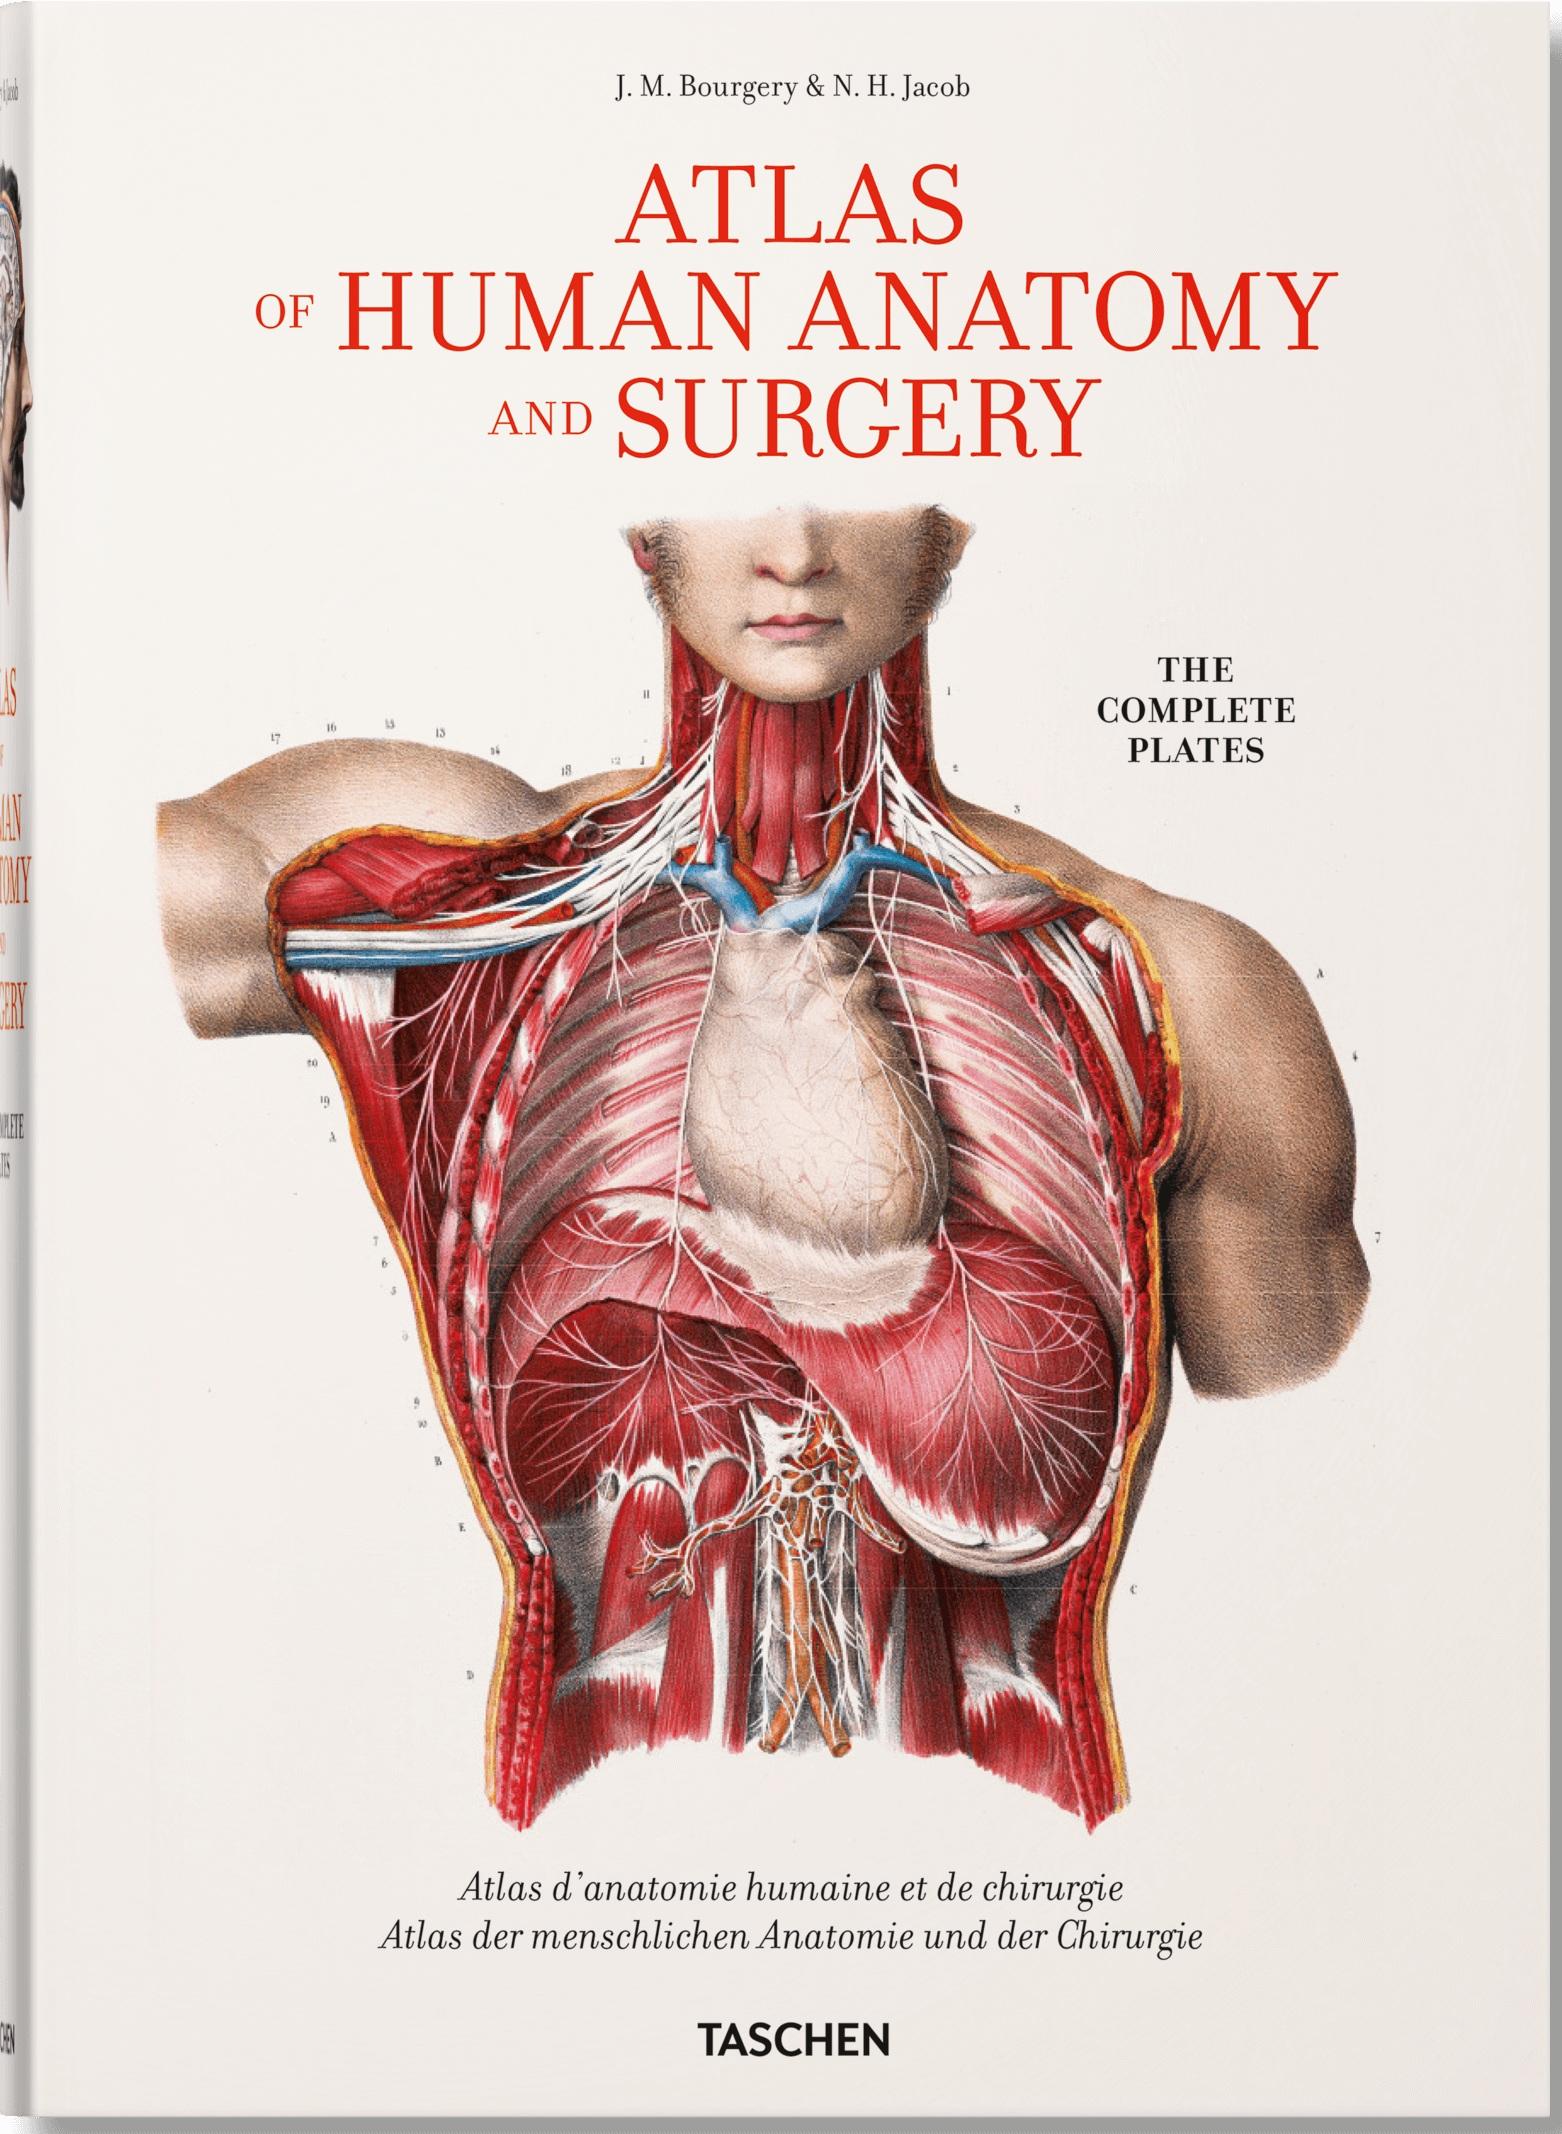 XL Bourgery. Atlas of Human Anatomy and Surgery